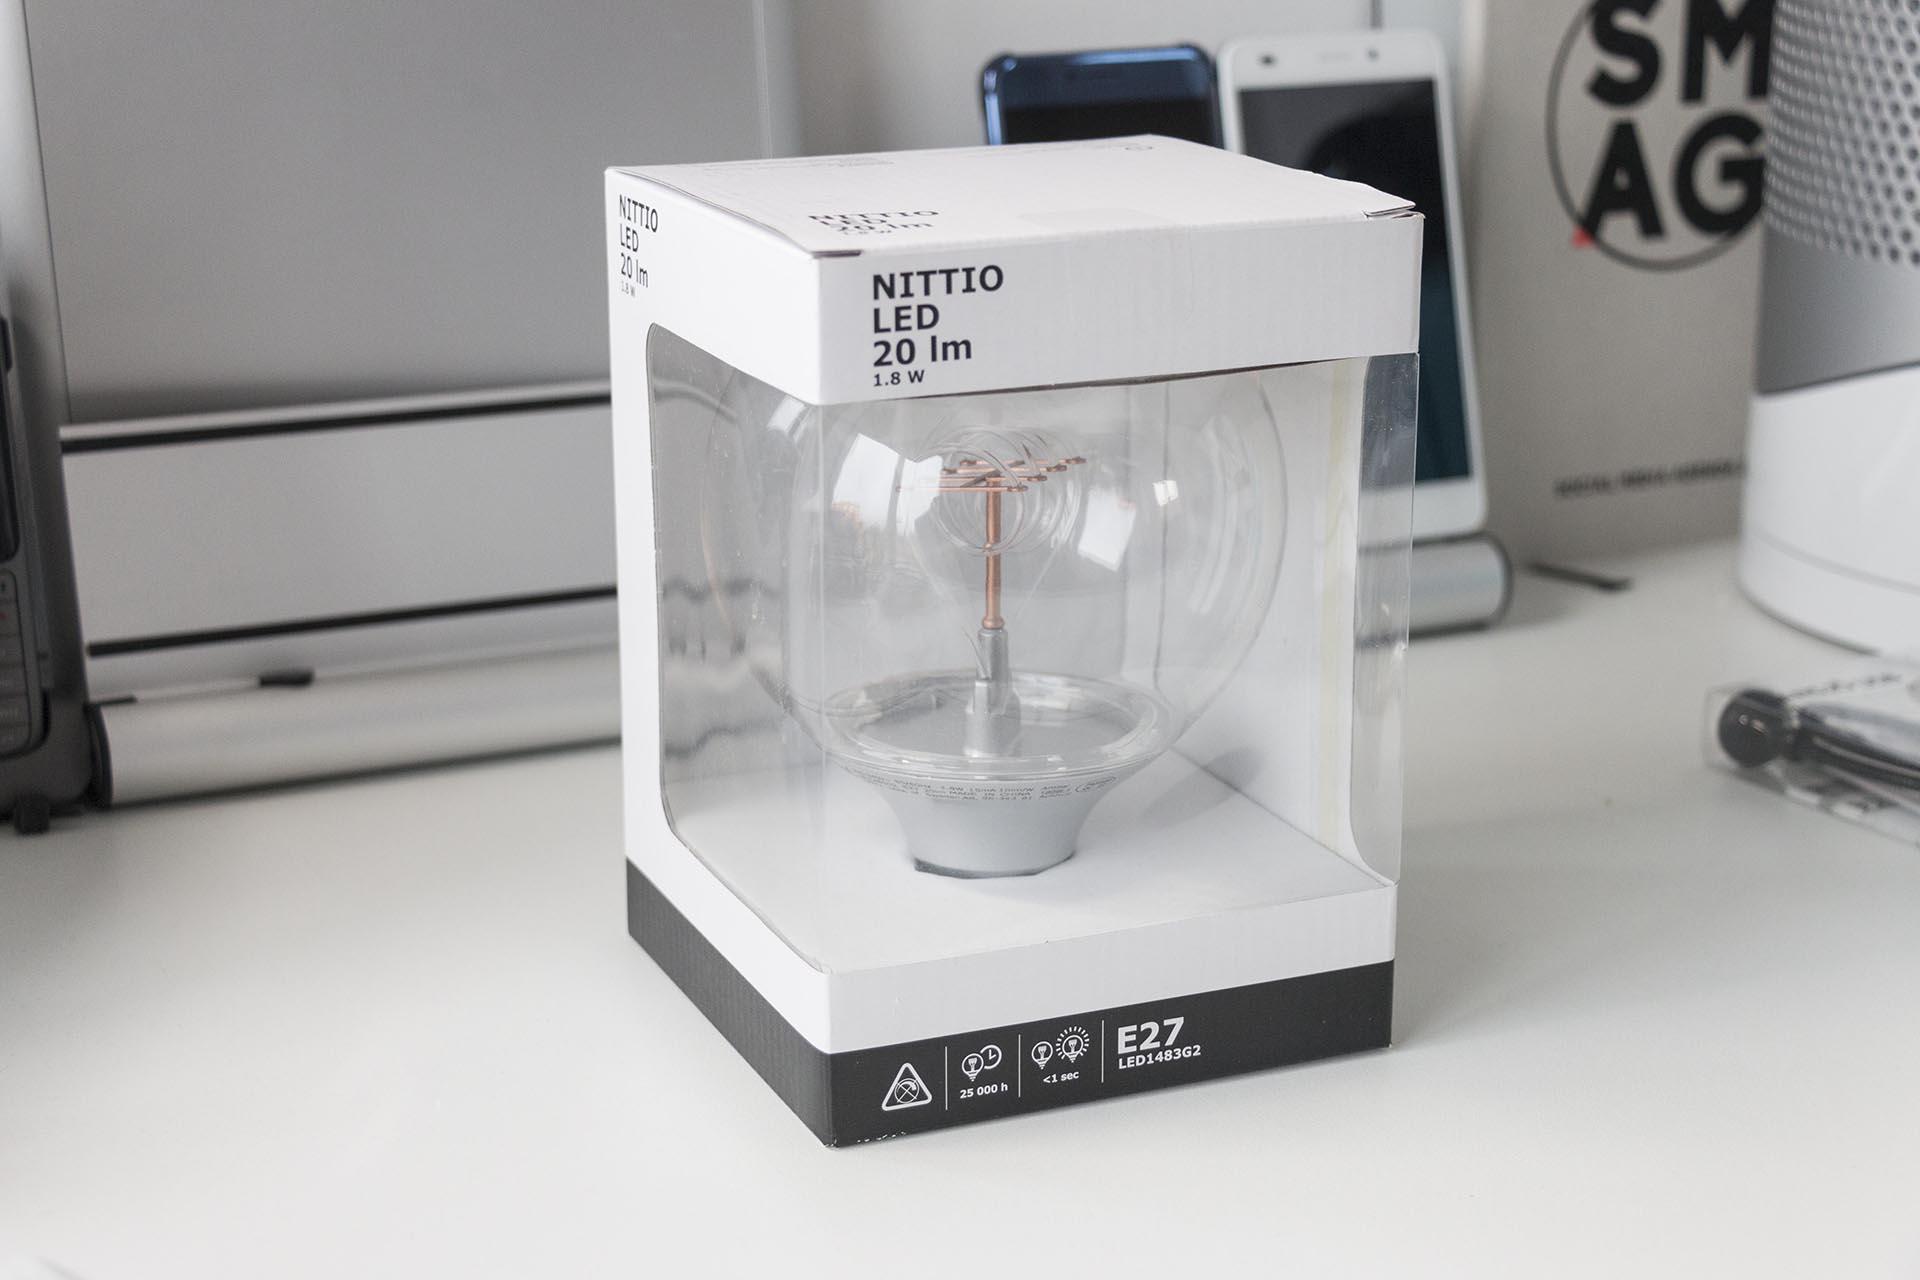 Review: Ikea Nittio (LED Lamp) - GadgetGear.nl